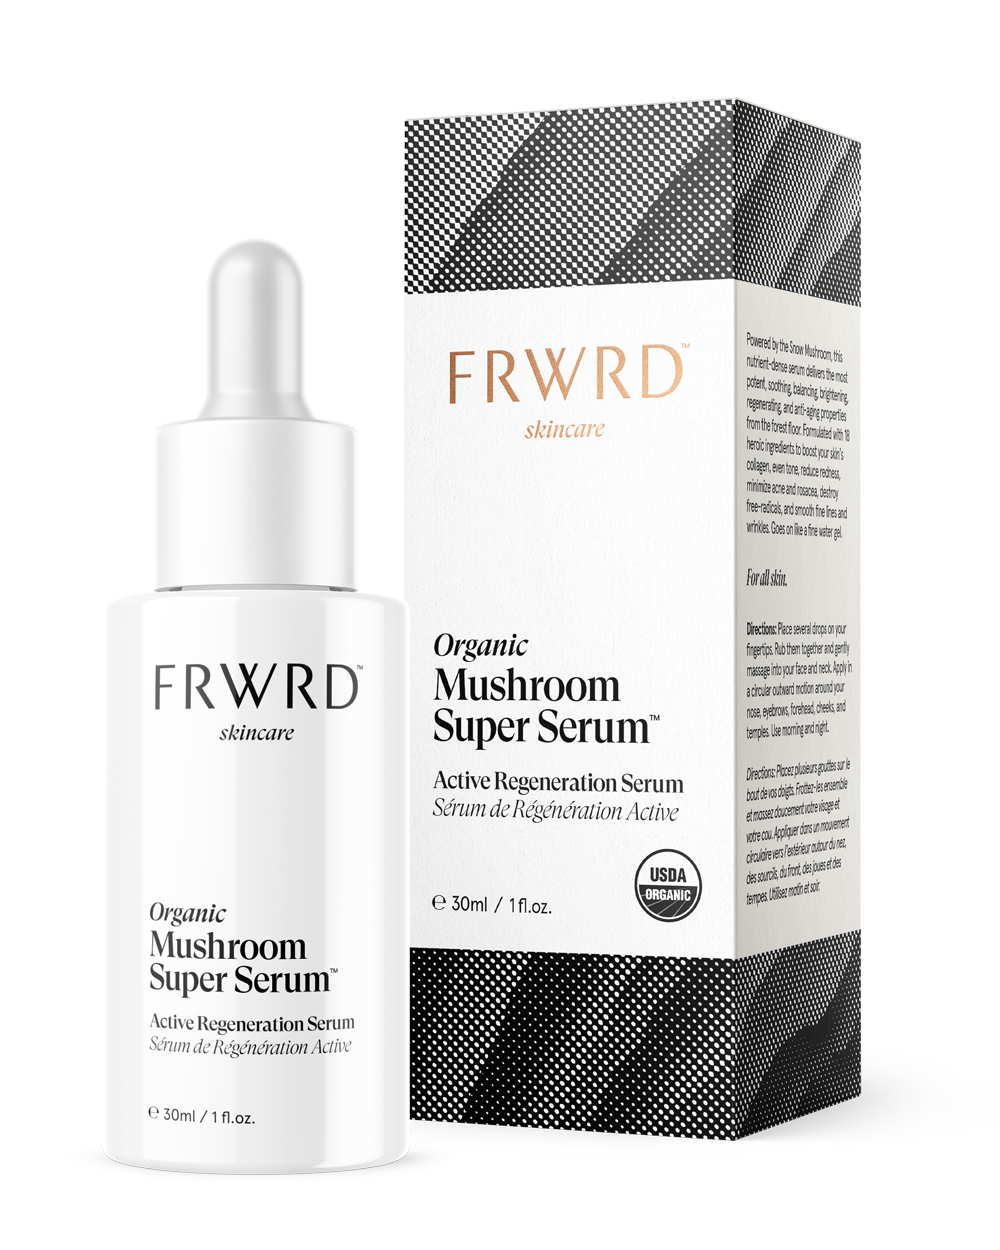 Organic Mushroom Super Serum